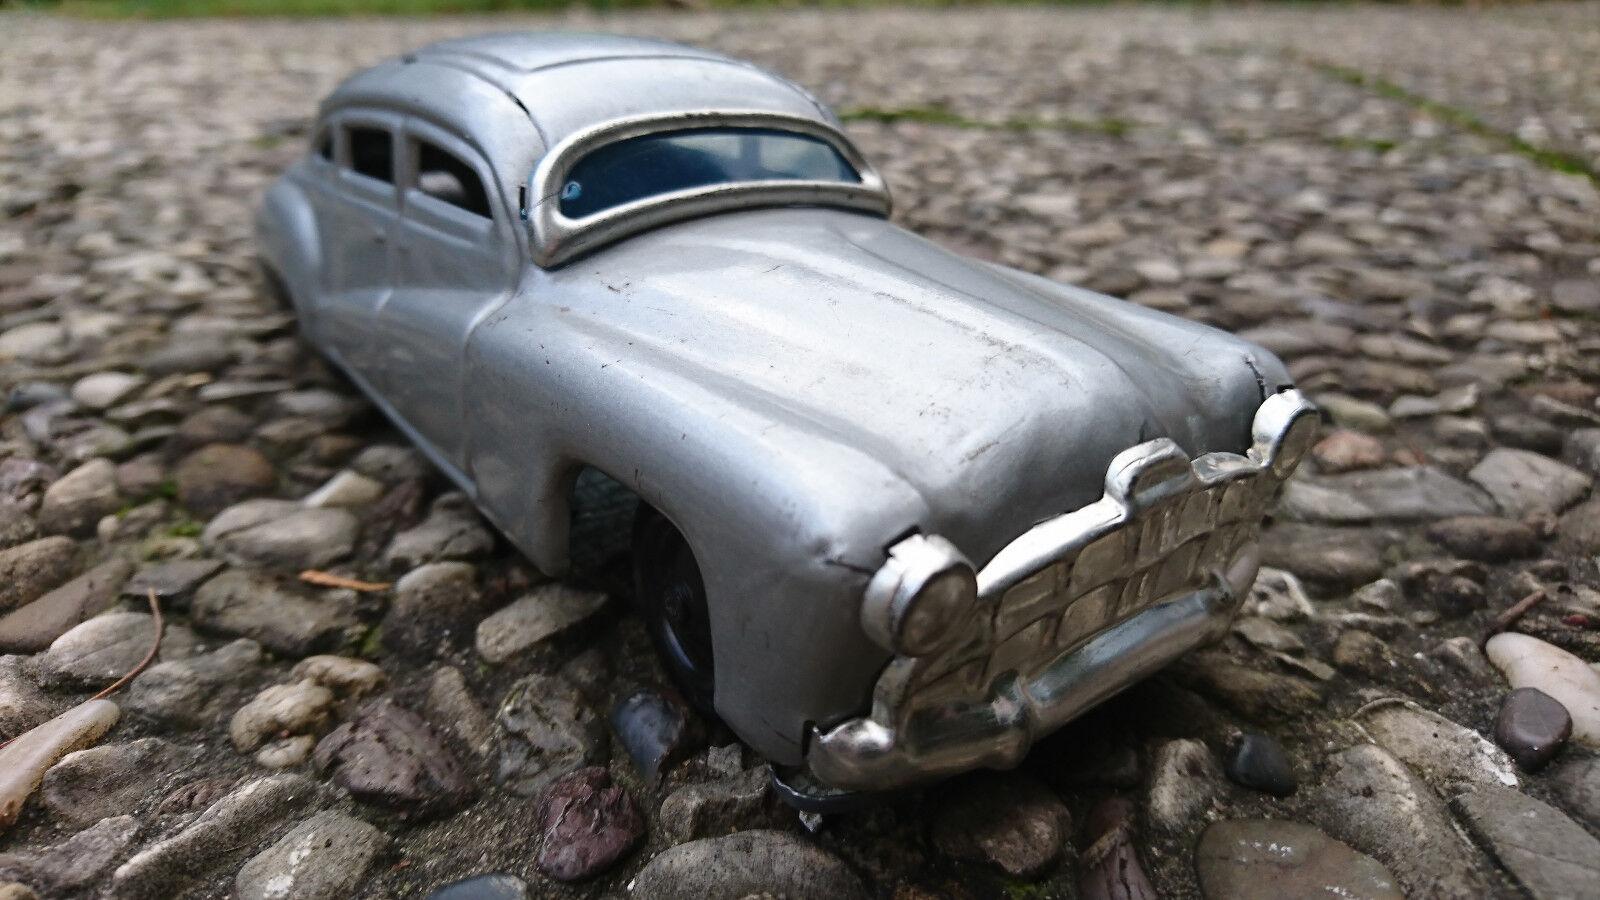 Tippco Blechauto Friktion tin toy lata rare Hudson Blechspielzeug Germany